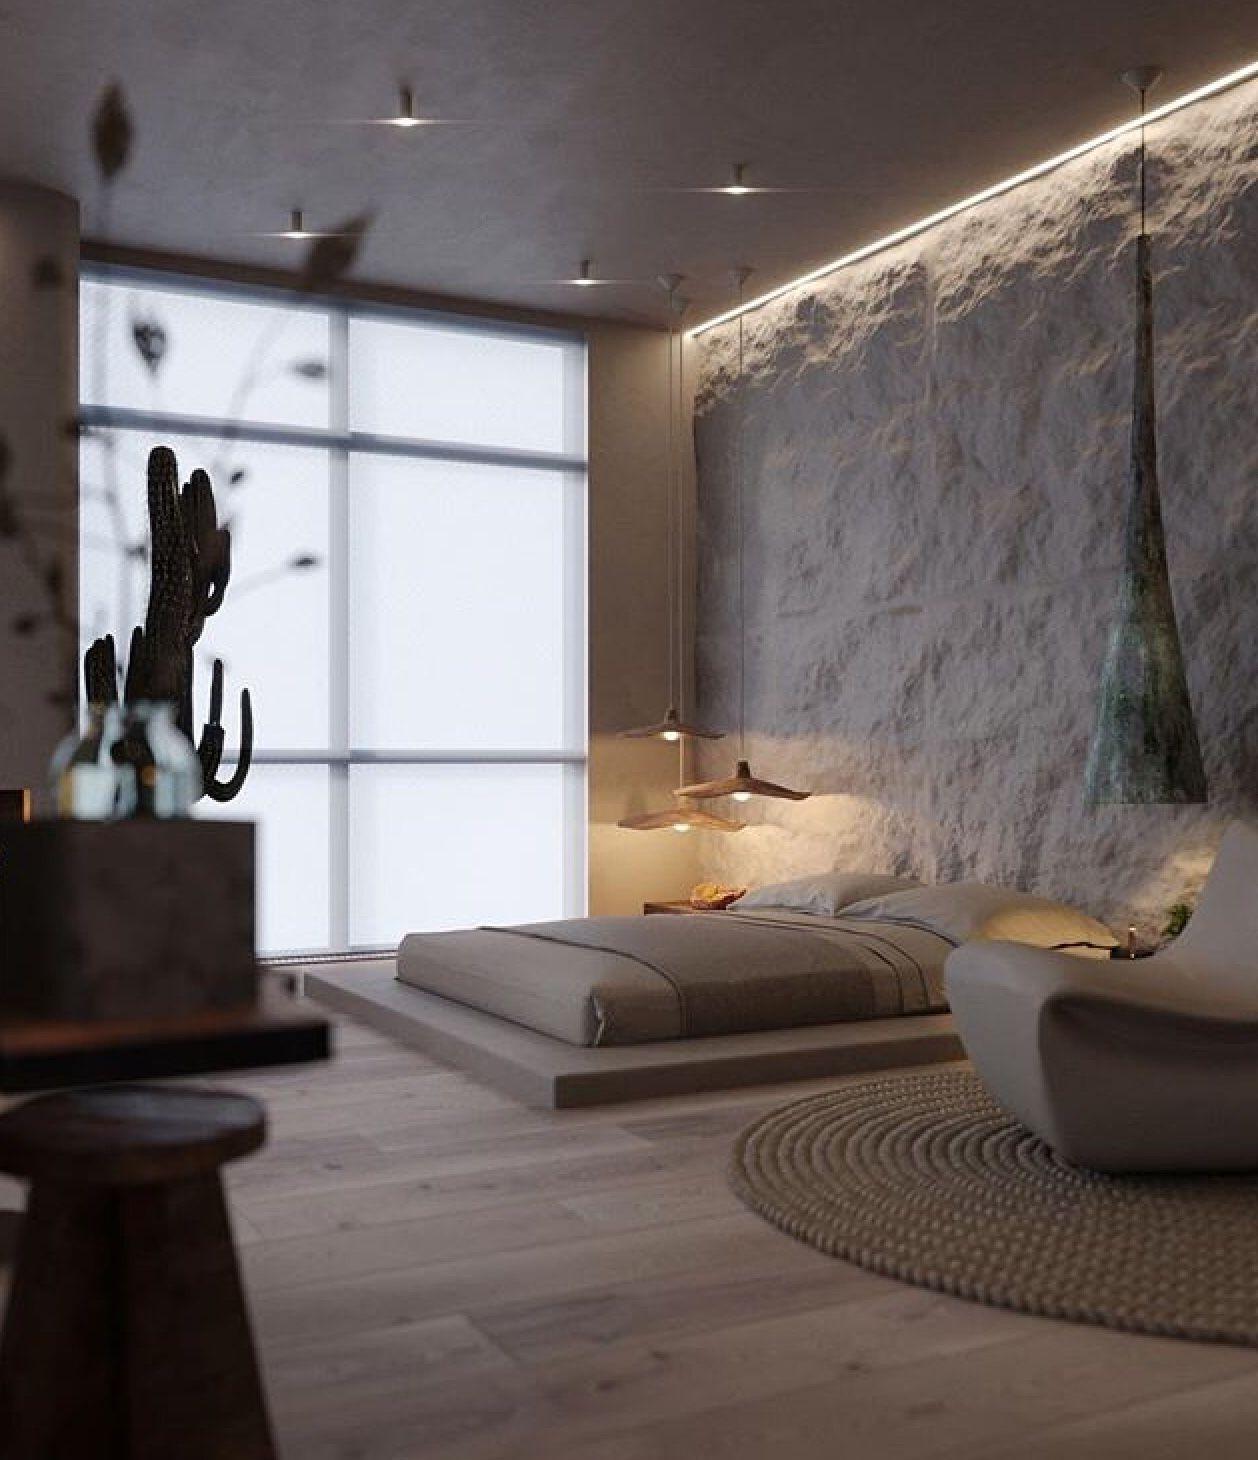 D Interiors Mała Sypialnia: Apartment Interior, Apartment Design, Home